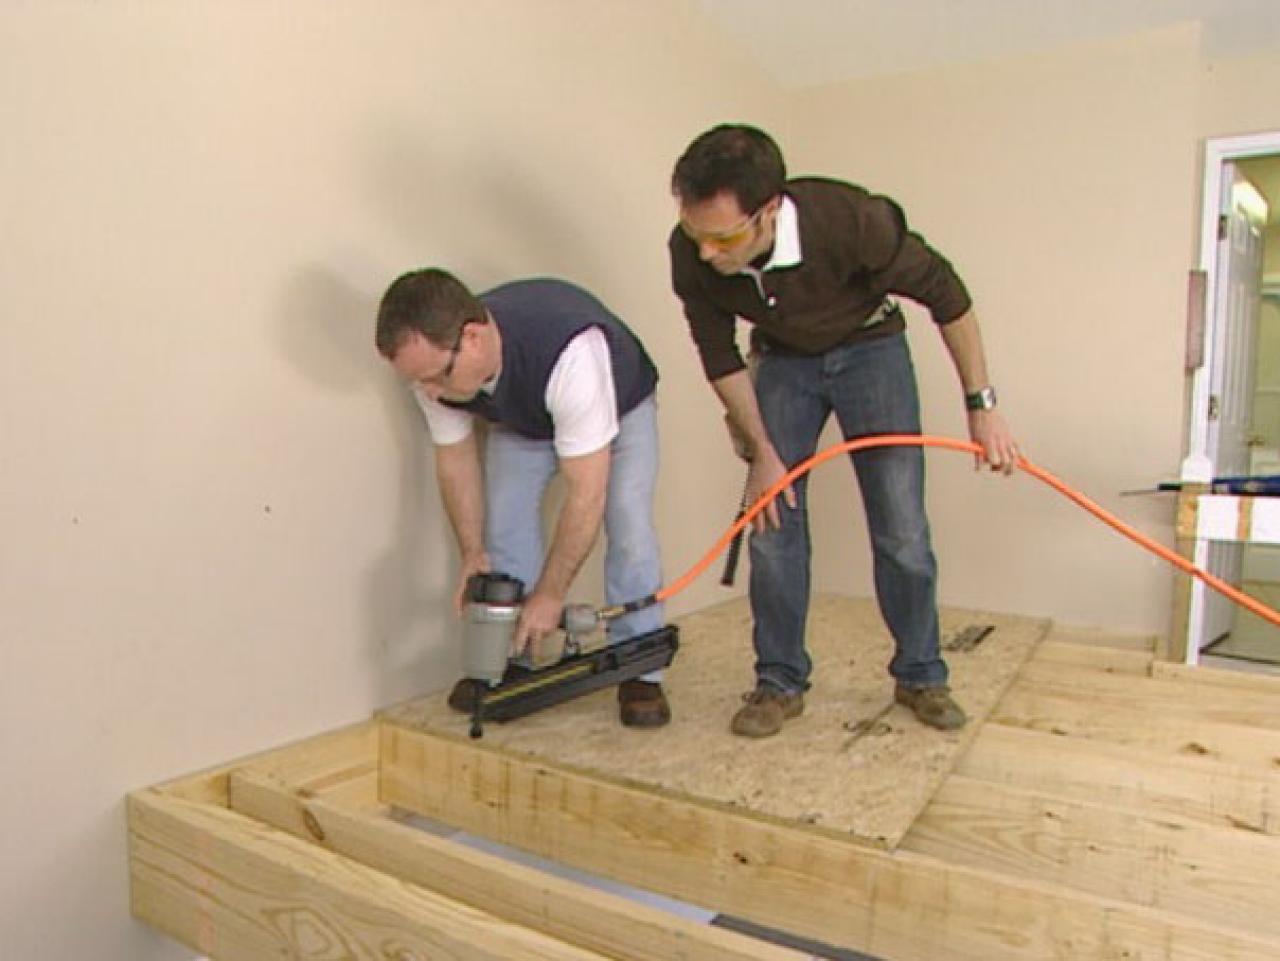 How to Create a Garage Loft | how-tos | DIY